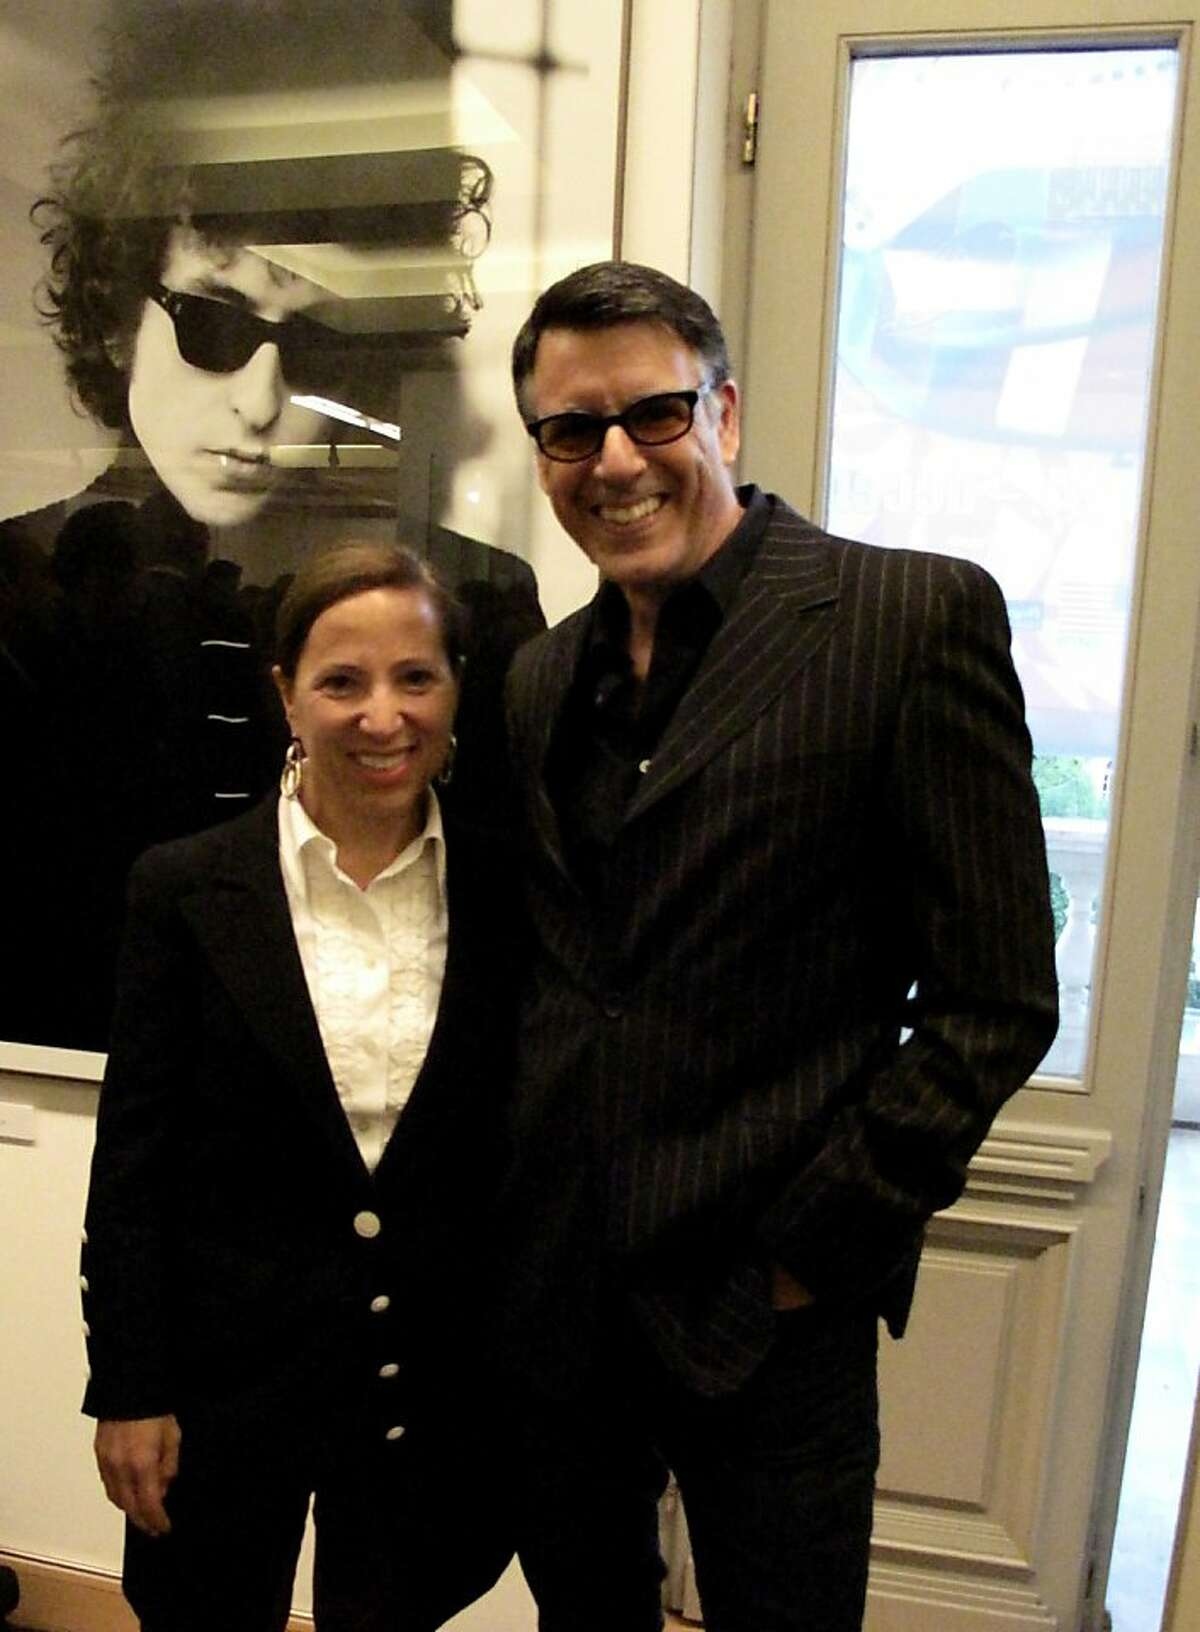 Ambassador Eleni Tsakapoulos Kounalakis and her husband, Markos Tsakopoulos Kounalakis, decked out in rocker clothes, attend the opening of Kogart House exhibition,